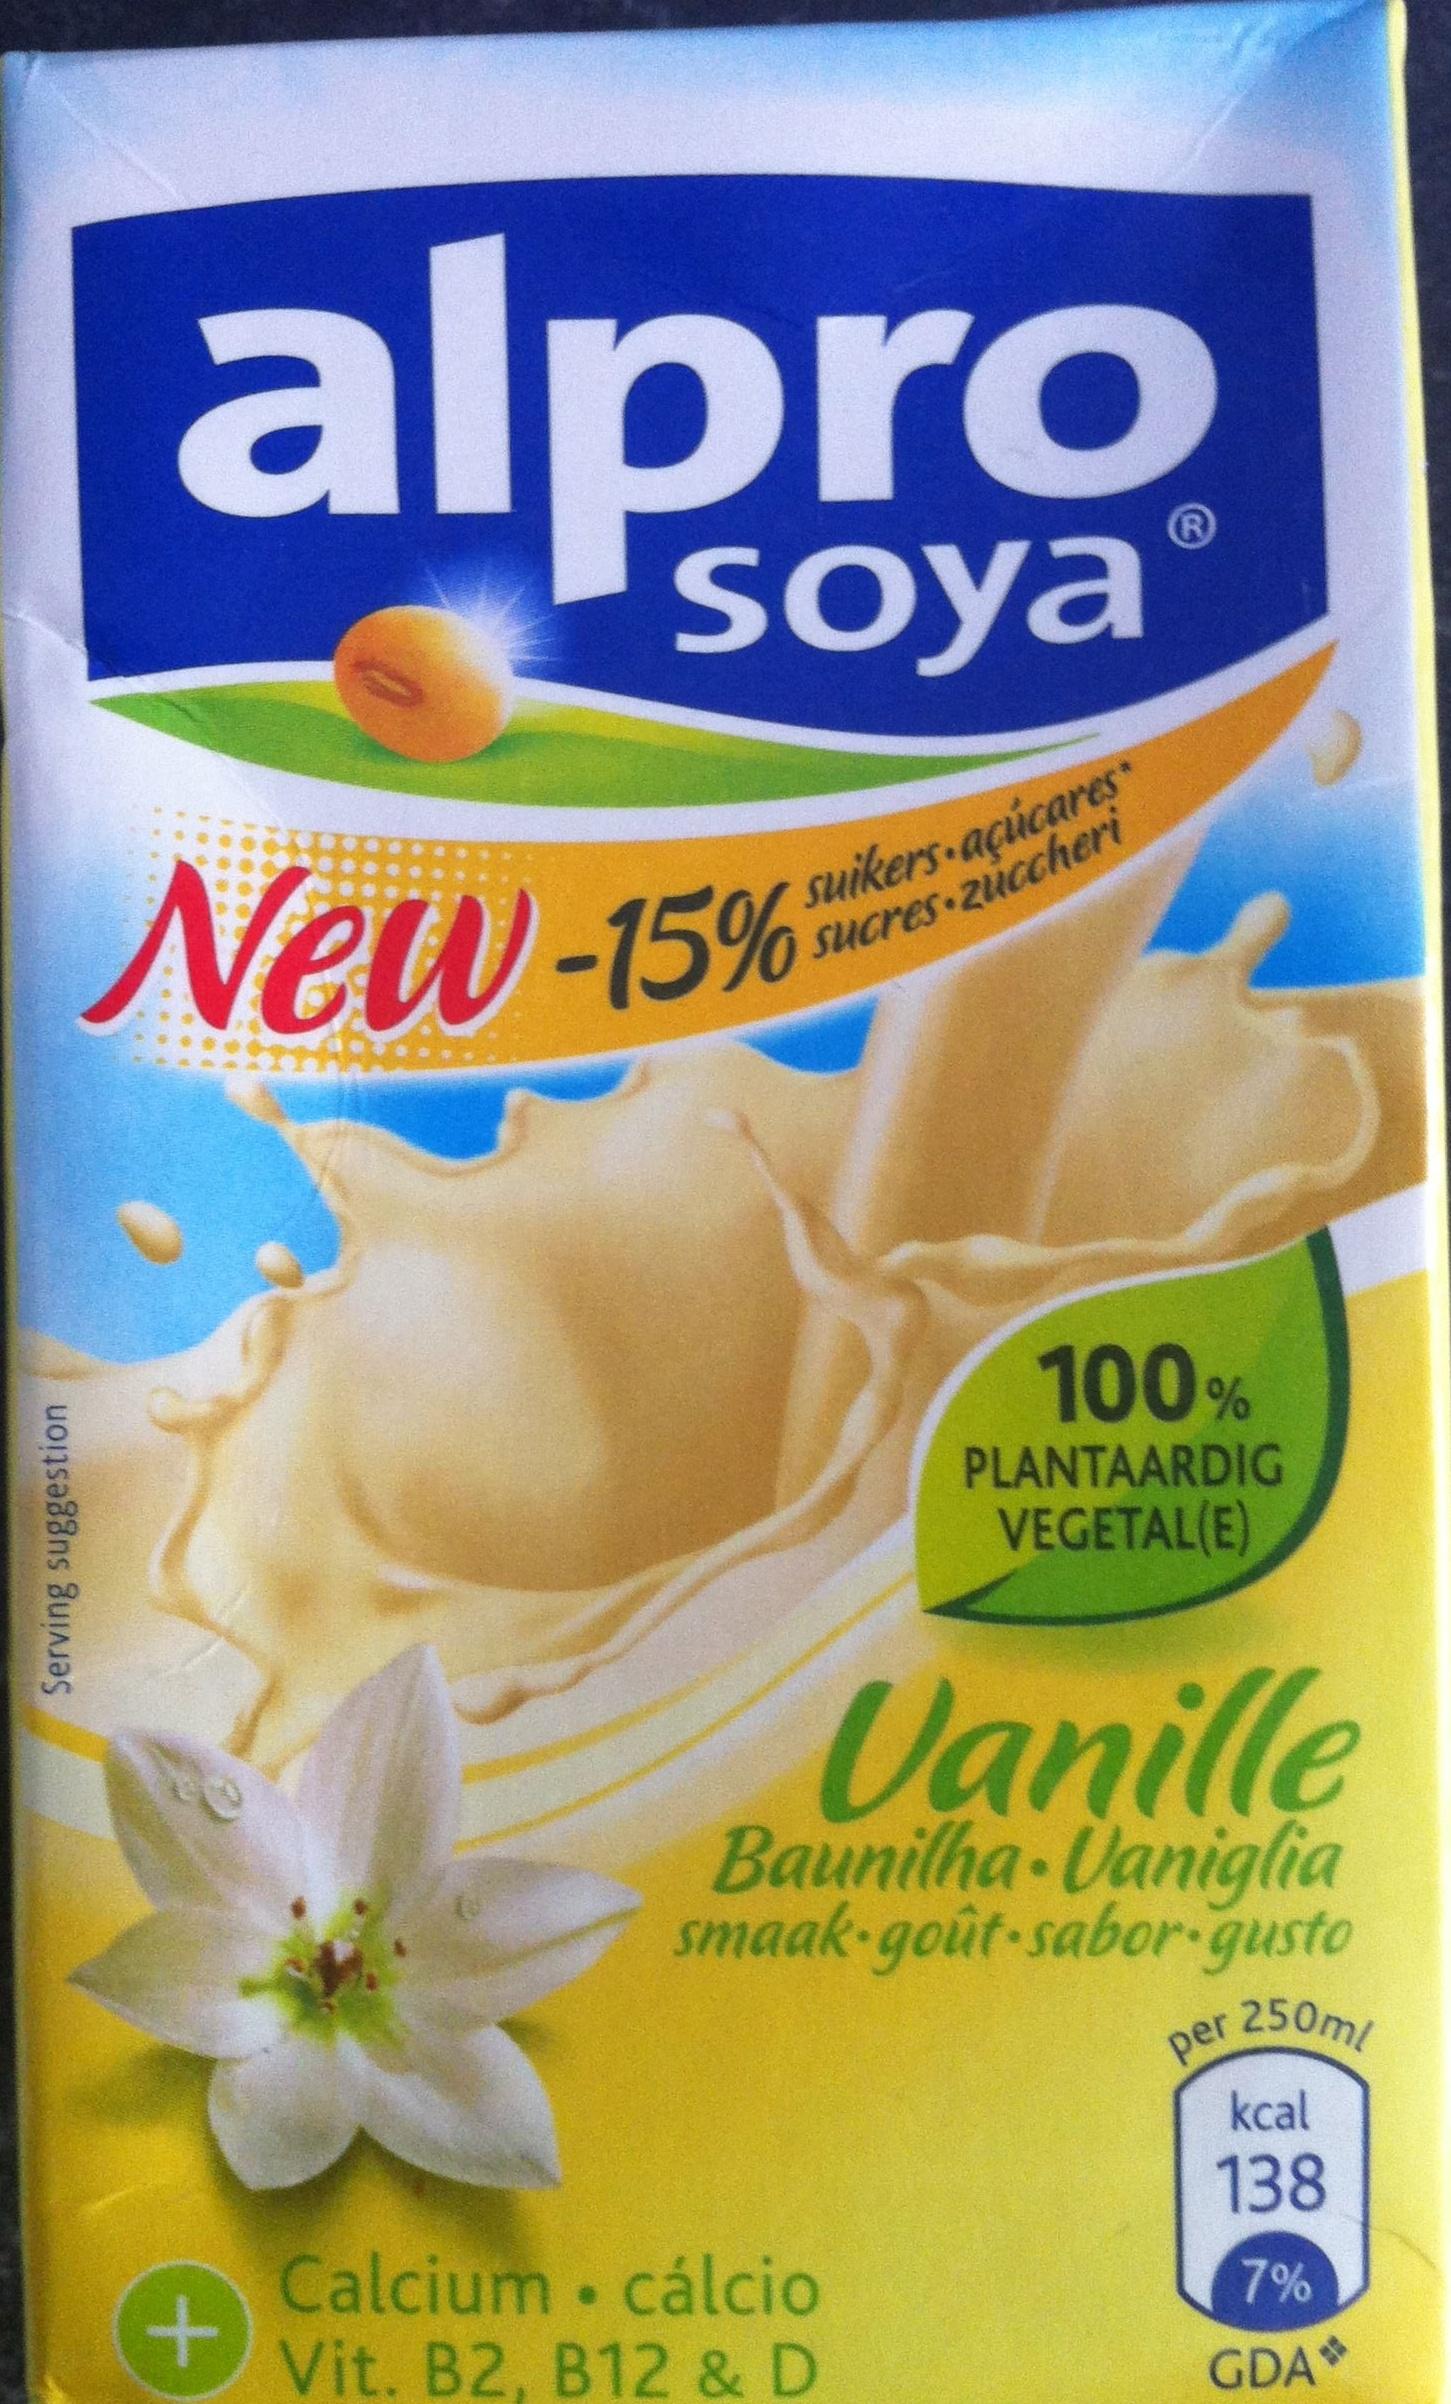 Alpro Soya Vanille - Product - fr